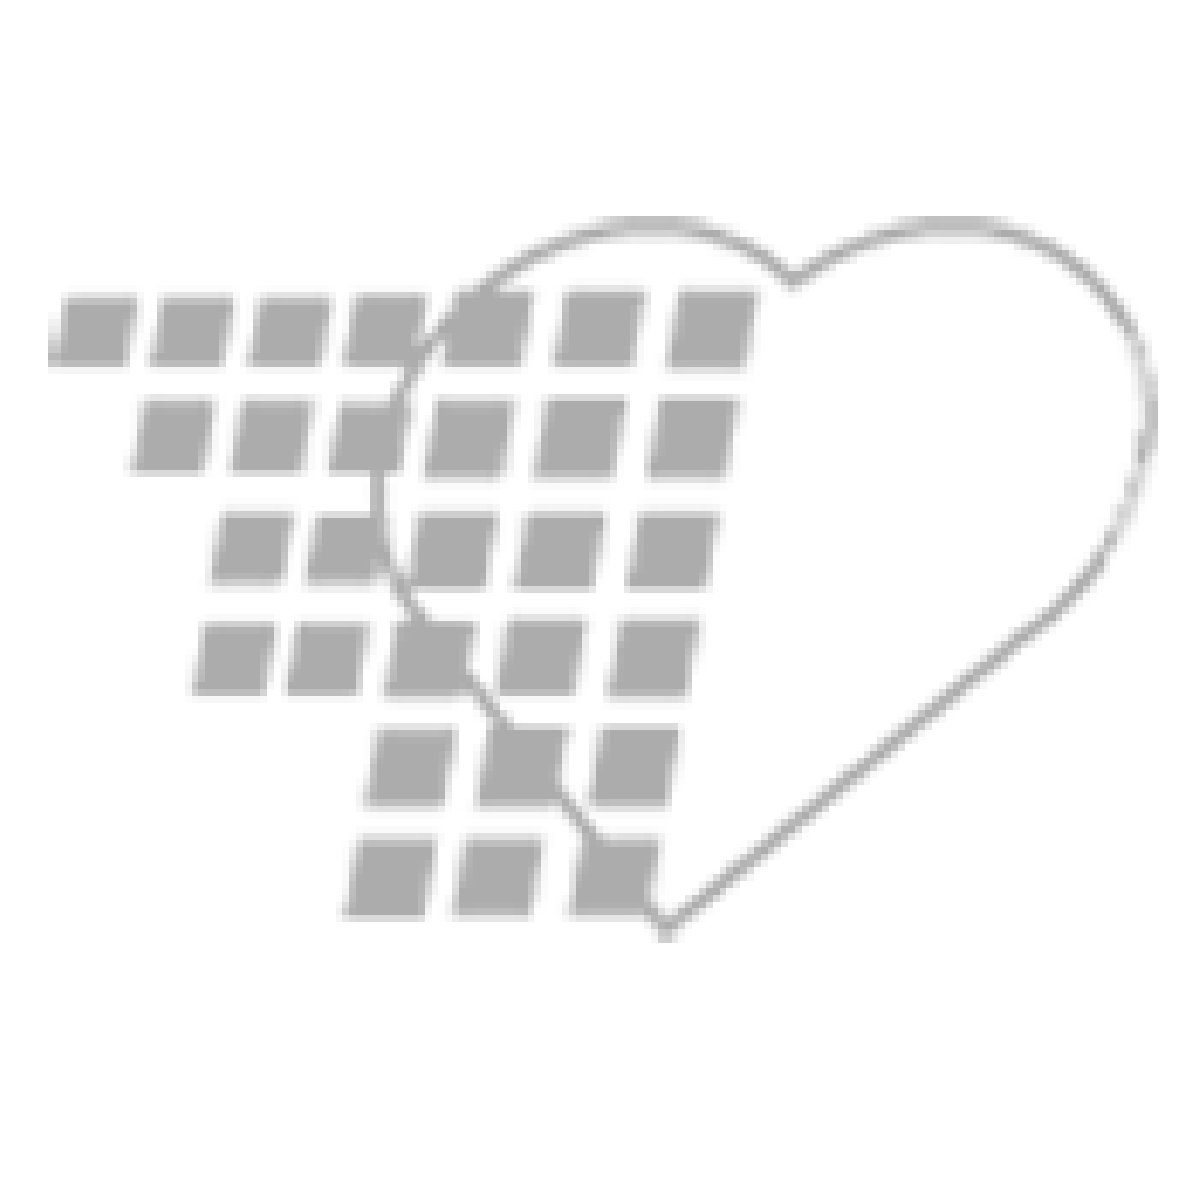 05-02-0411 - Sterile Lube Jelly Syringe 10 g